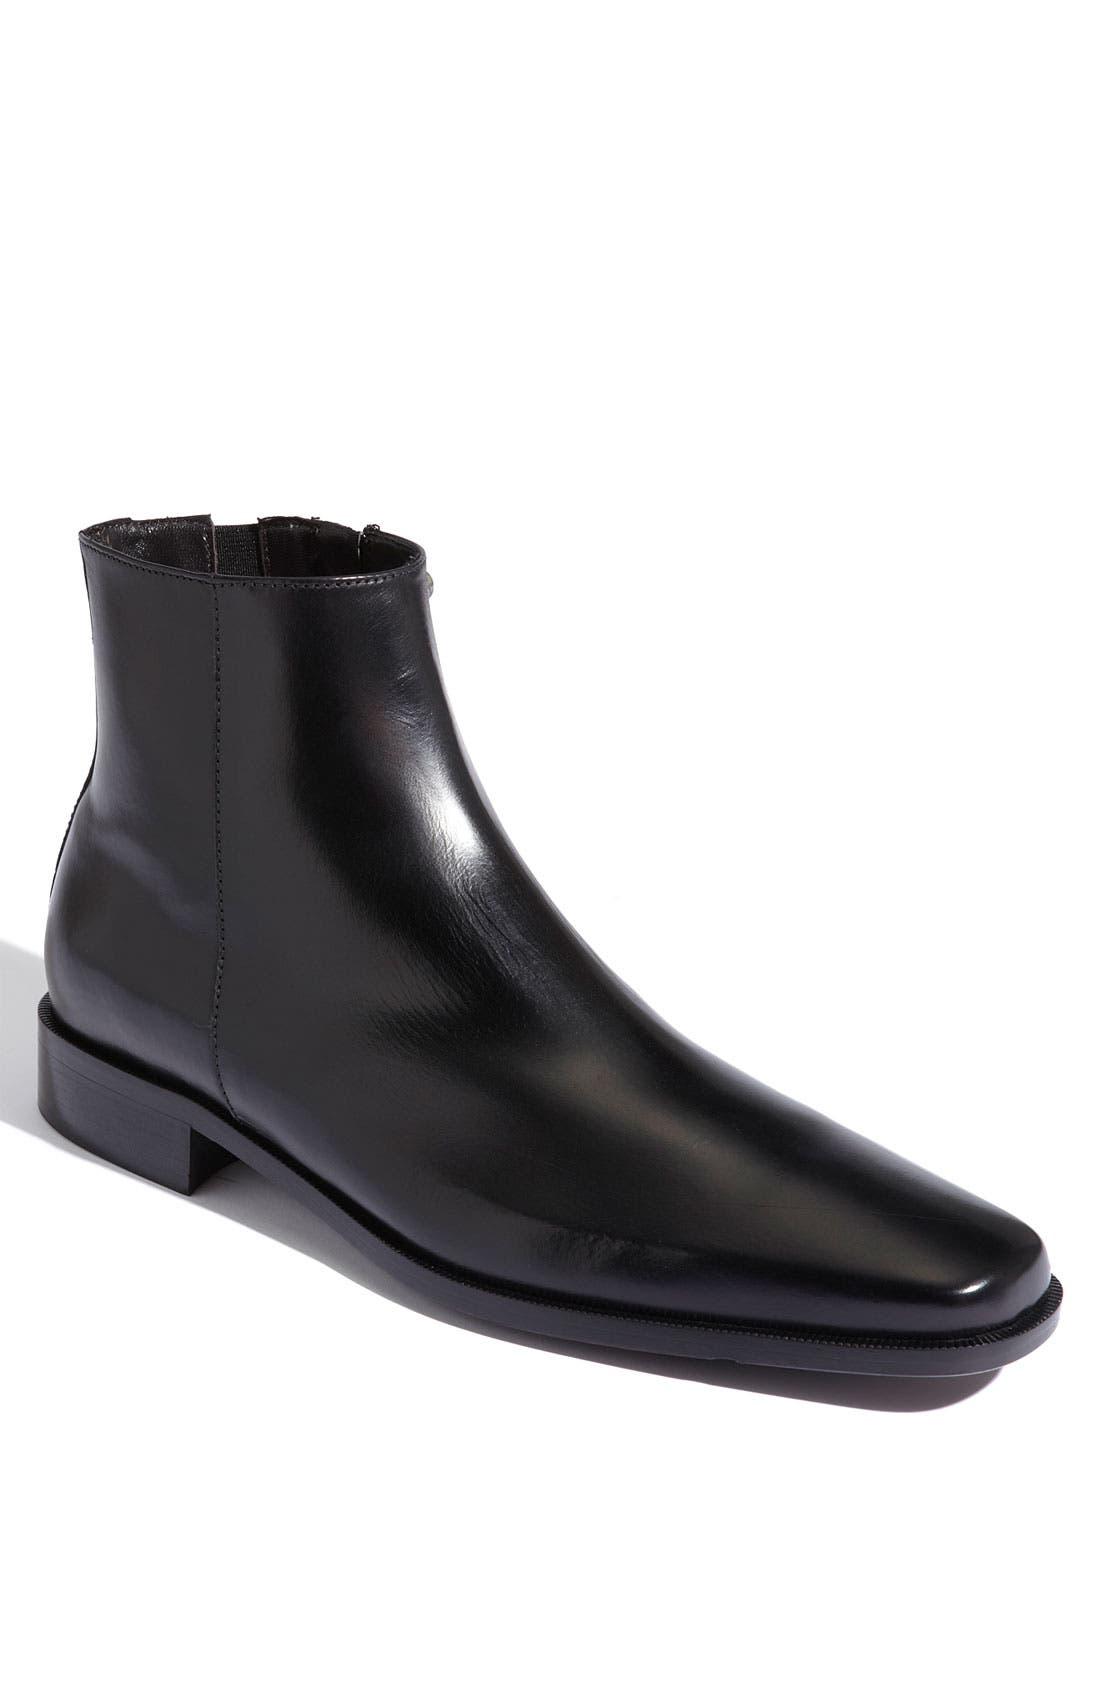 Main Image - Donald J Pliner 'Ring' Boot